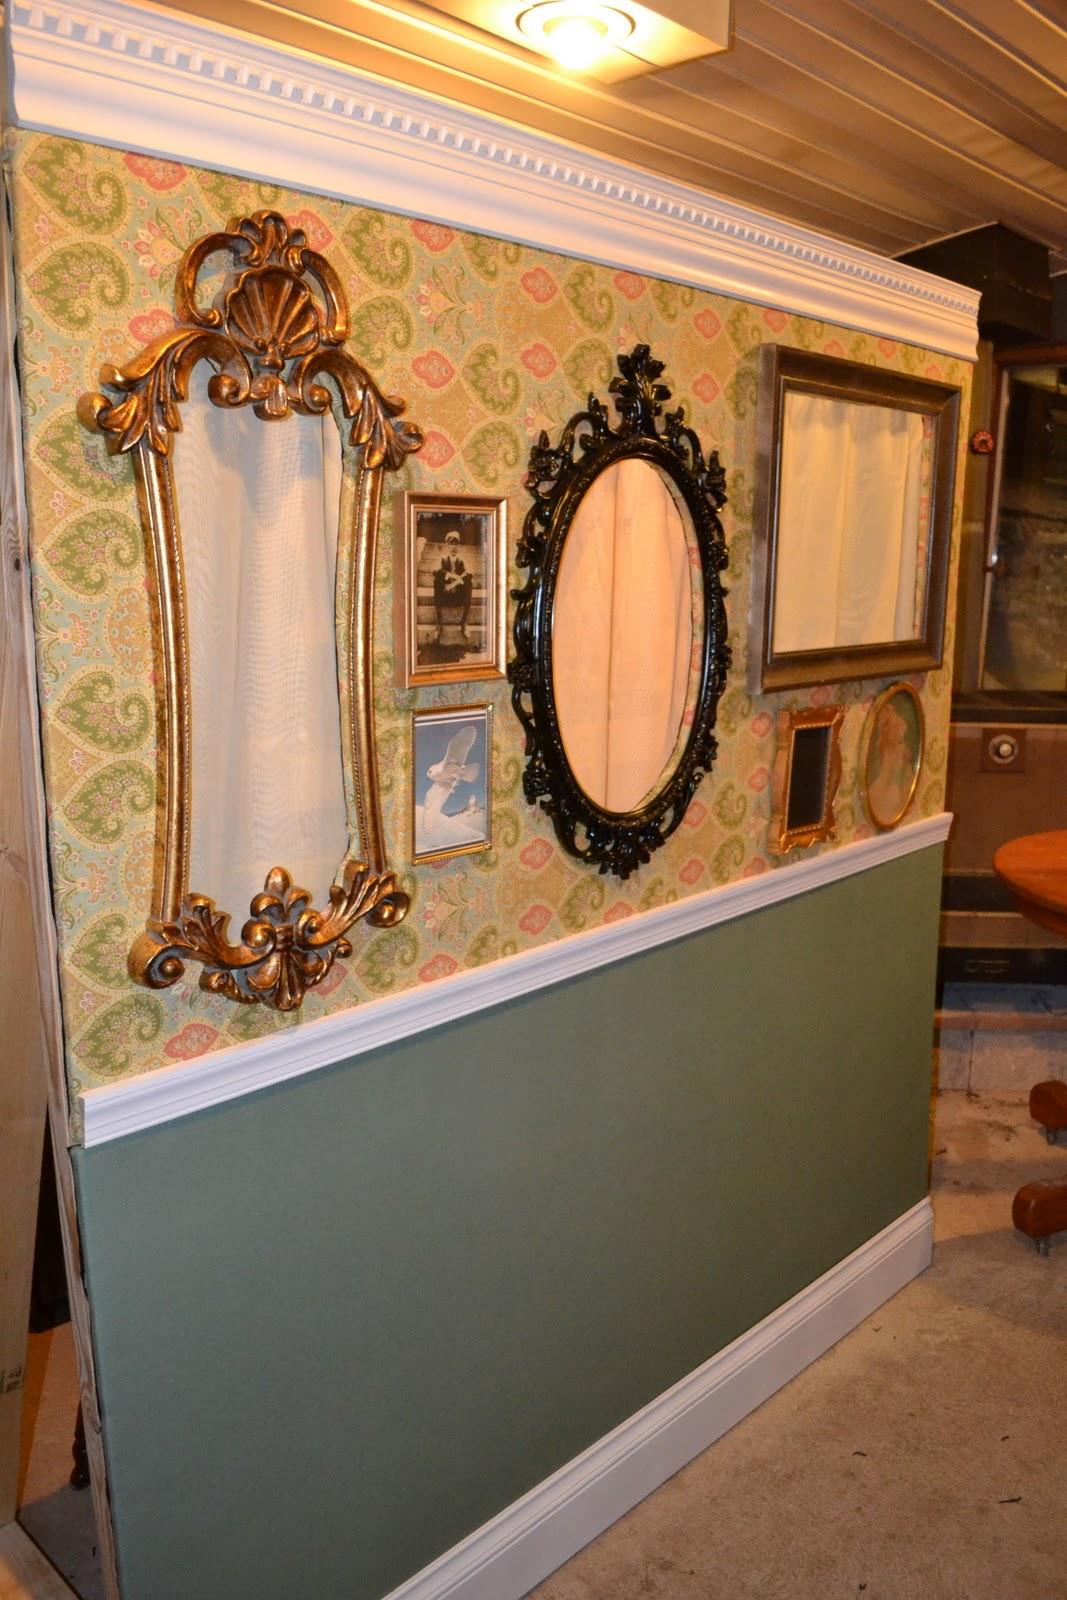 quaint oaks diy photo booth alternative. Black Bedroom Furniture Sets. Home Design Ideas